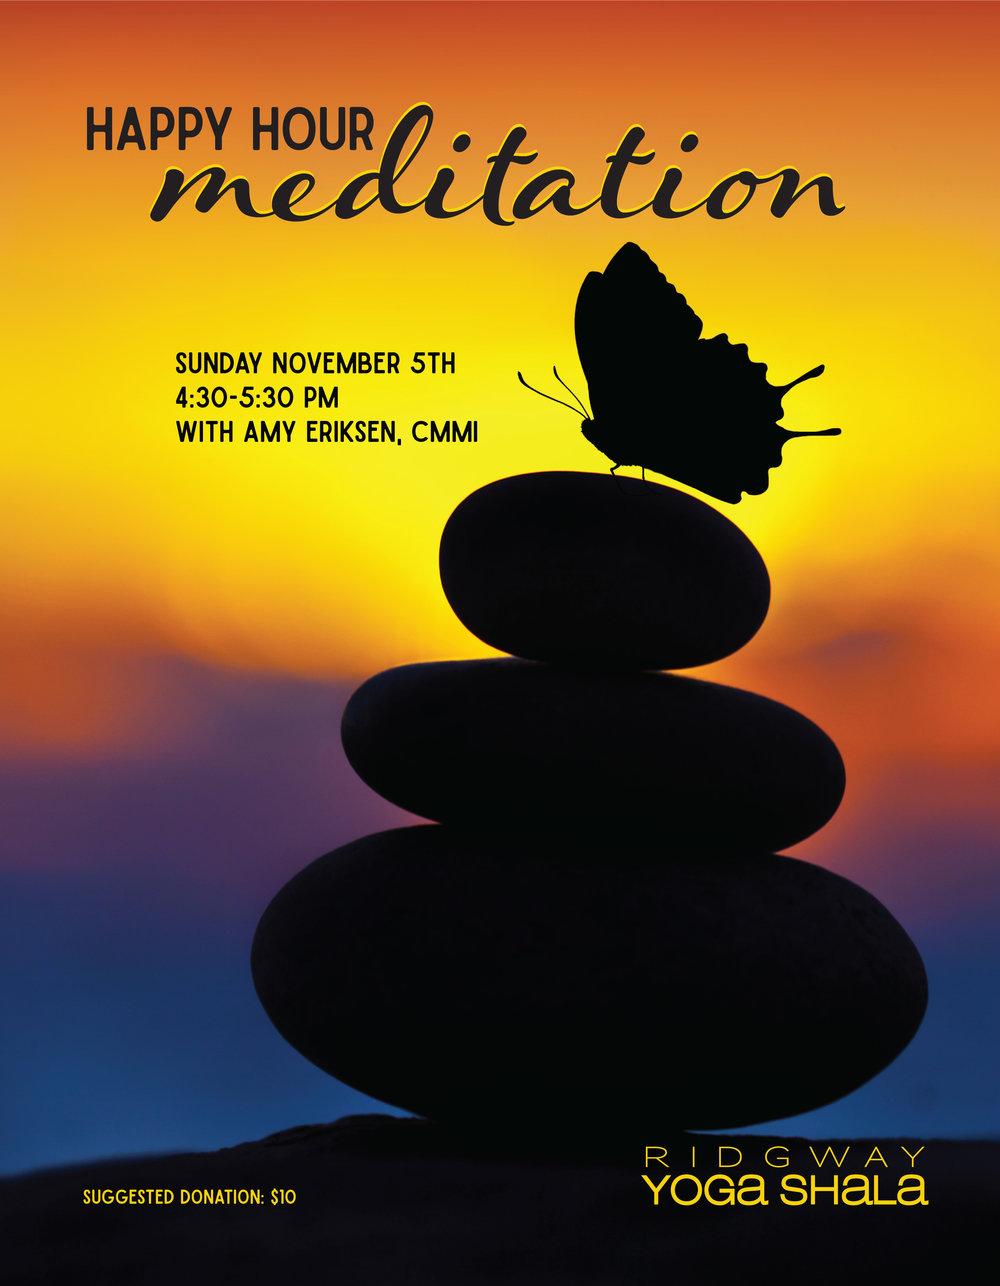 happy-hour-meditation-flyer-01.jpg